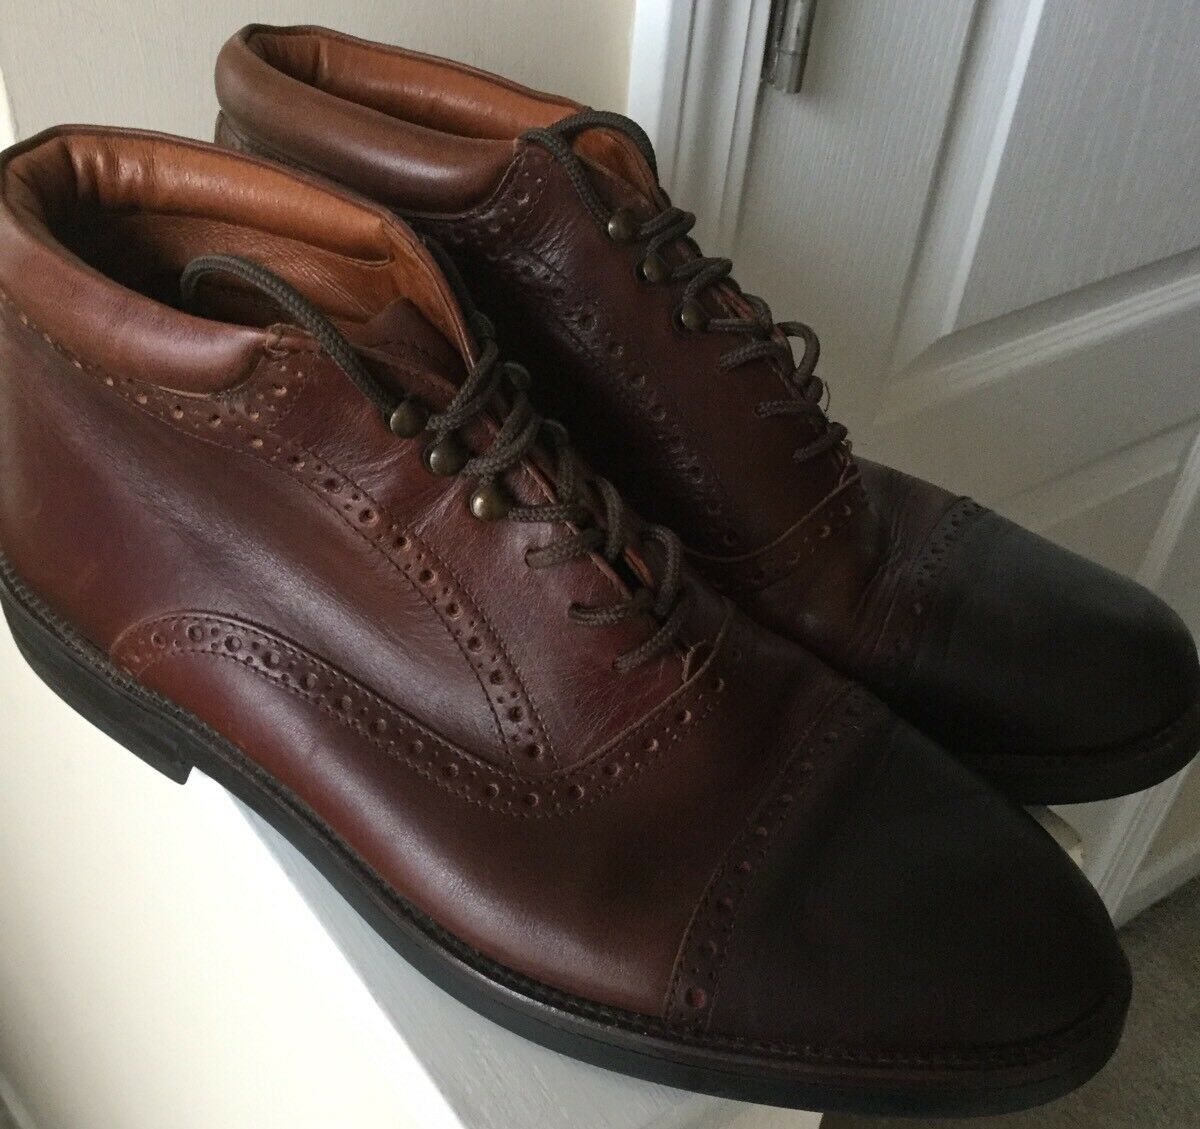 Johnston & Murphy Made in  11.5 M herren braun braun braun leather Stiefel Cap Toe Design bf3fe9